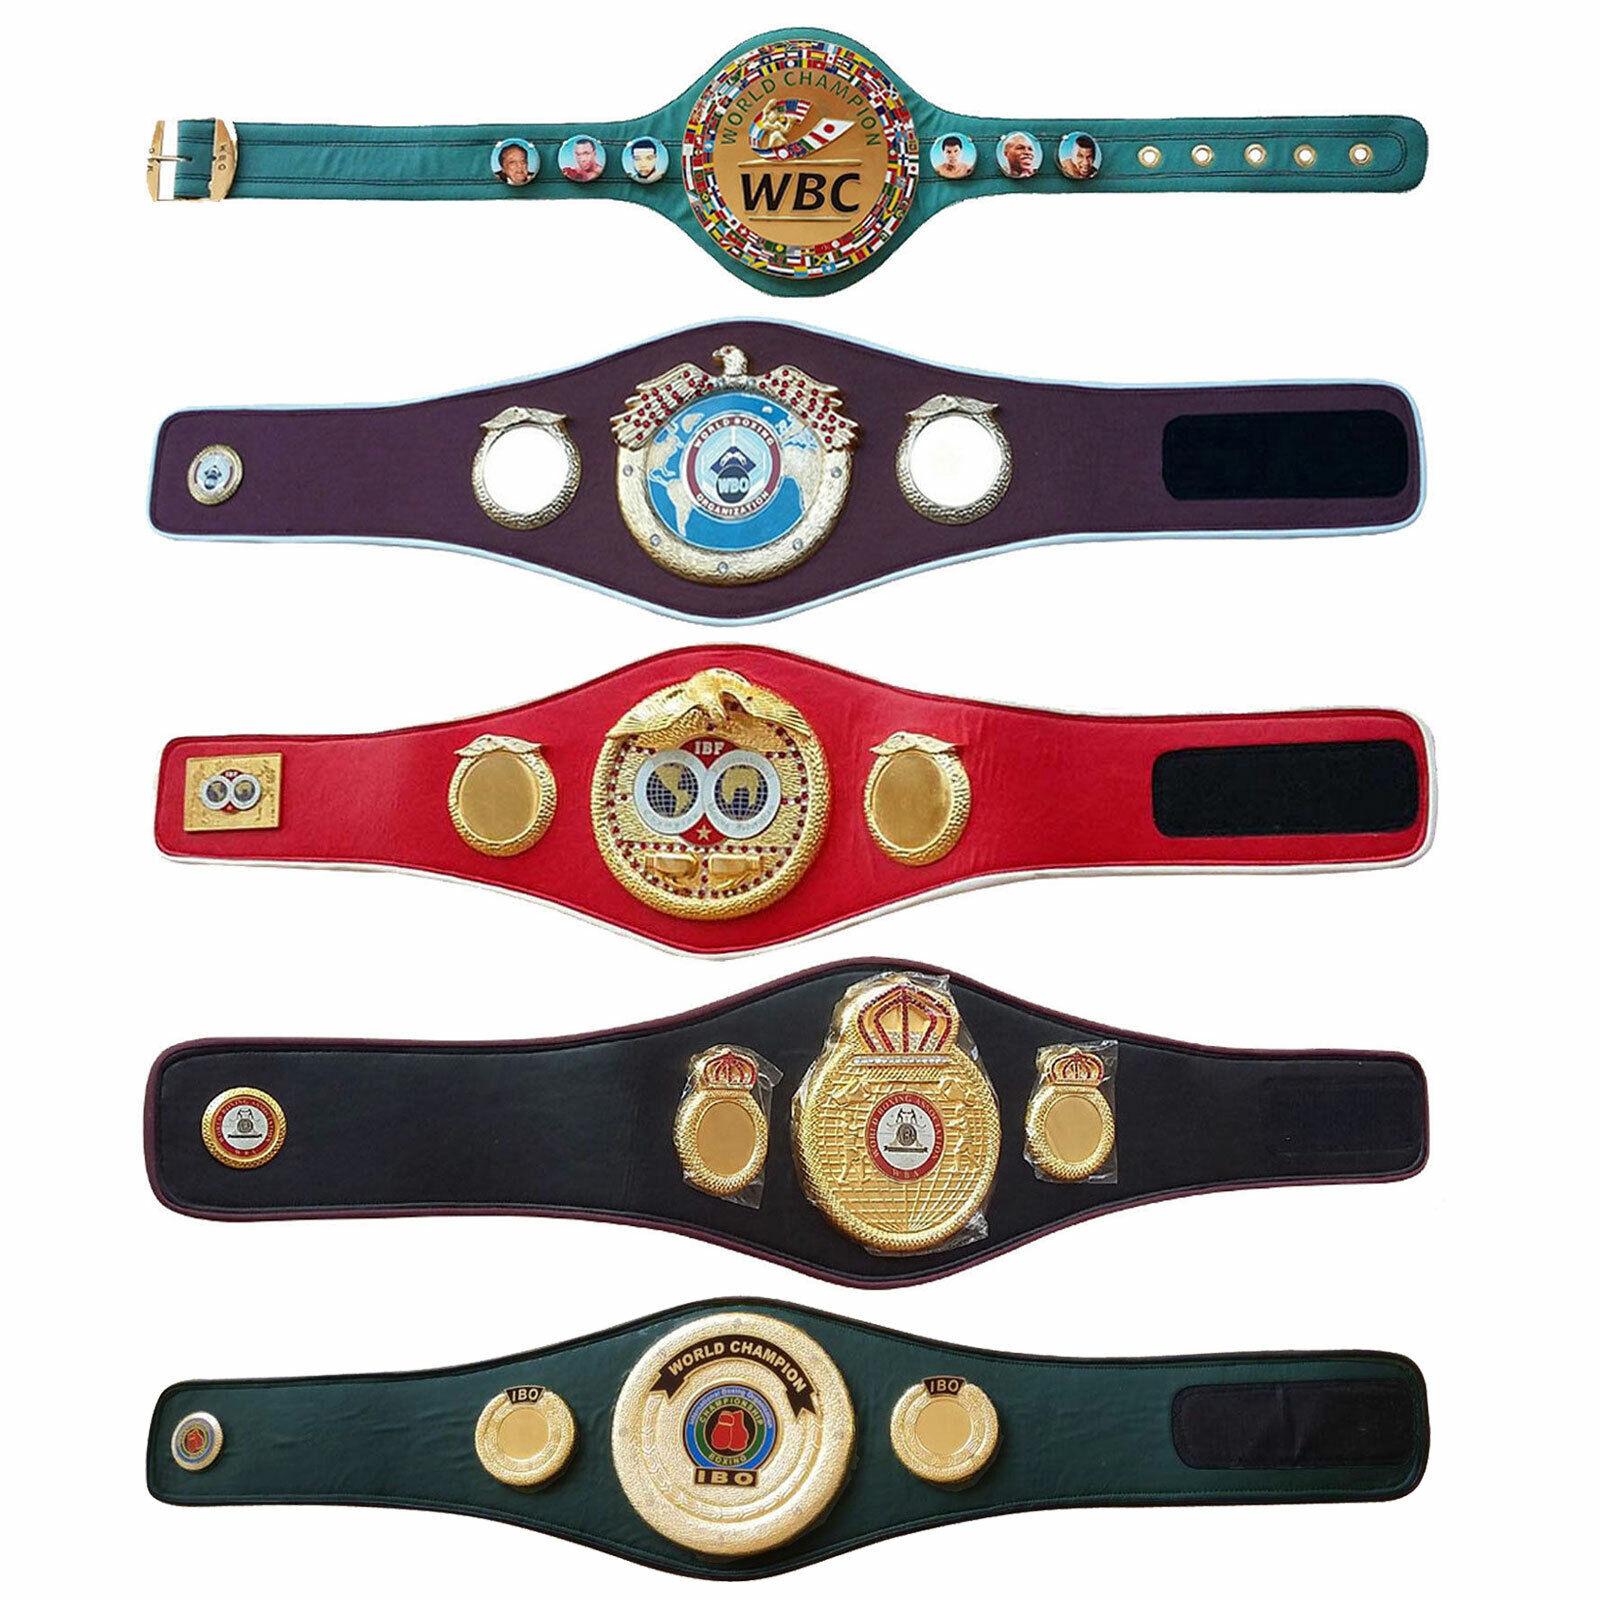 WBC WBA WBO IBO IBF Championship Boxing Belt Adult Belts Premium Quality Leather